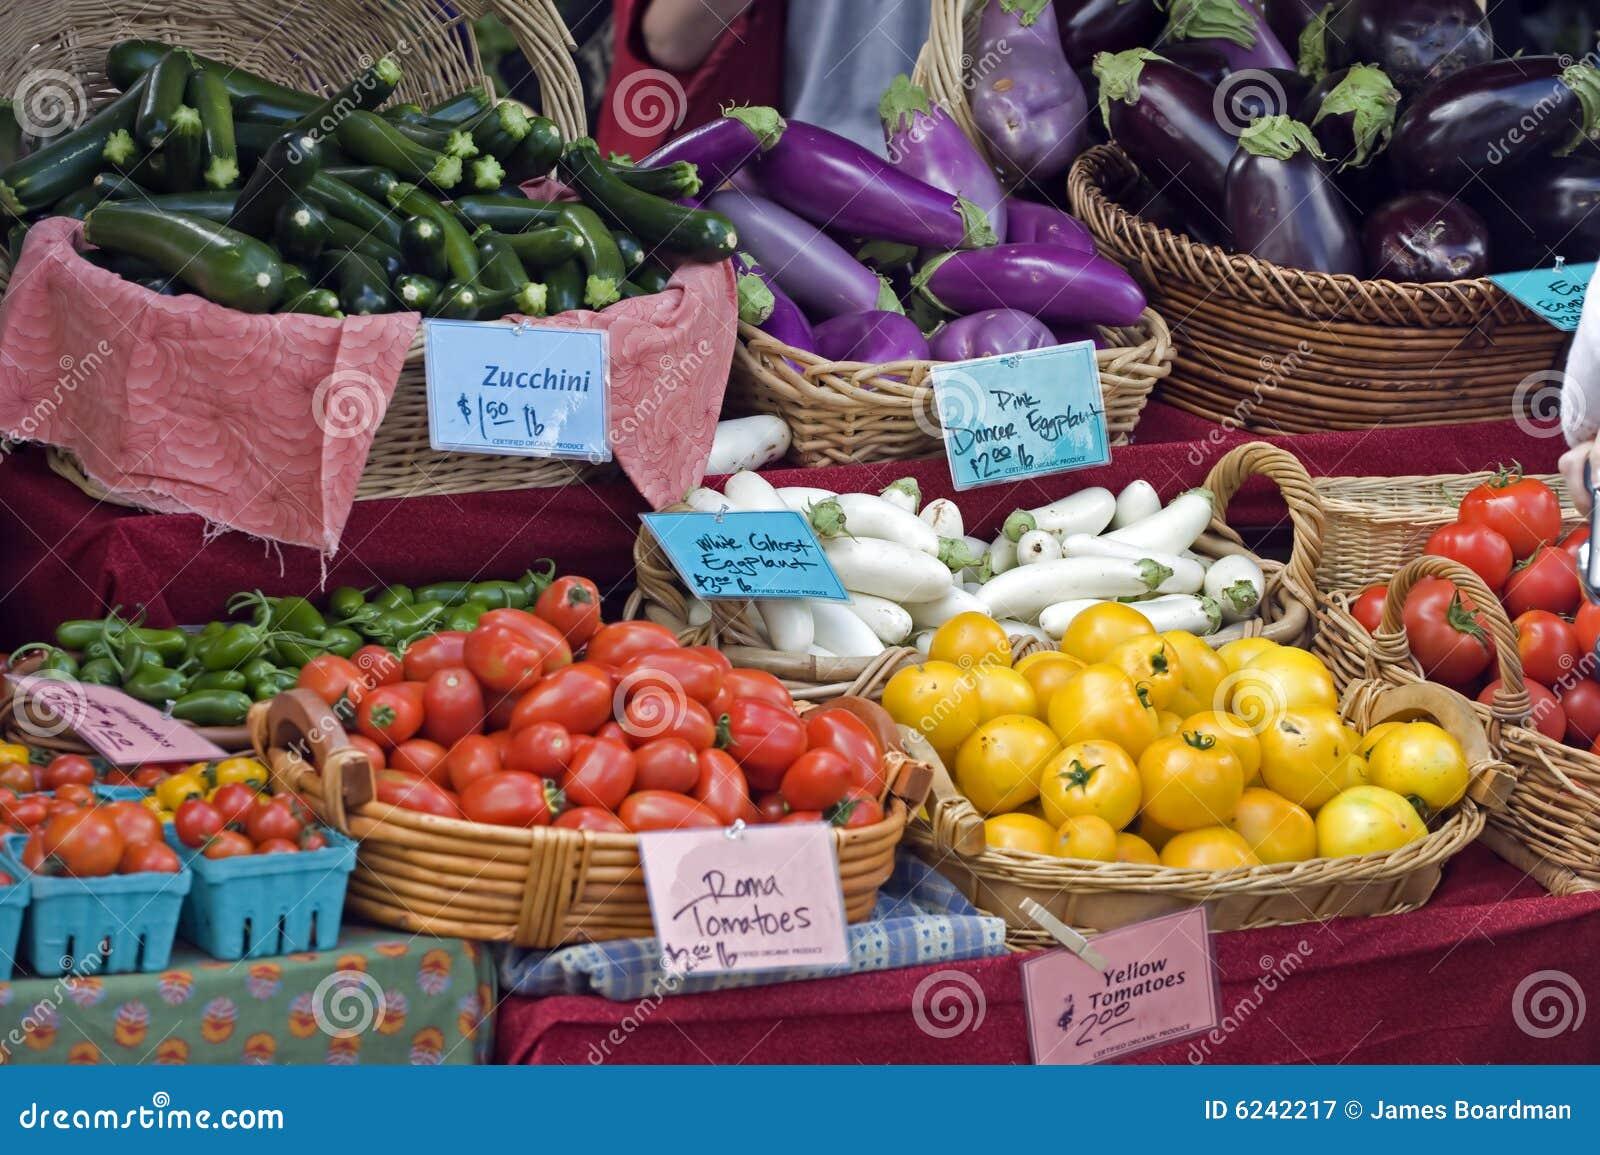 Farmers Market fresh vegtables